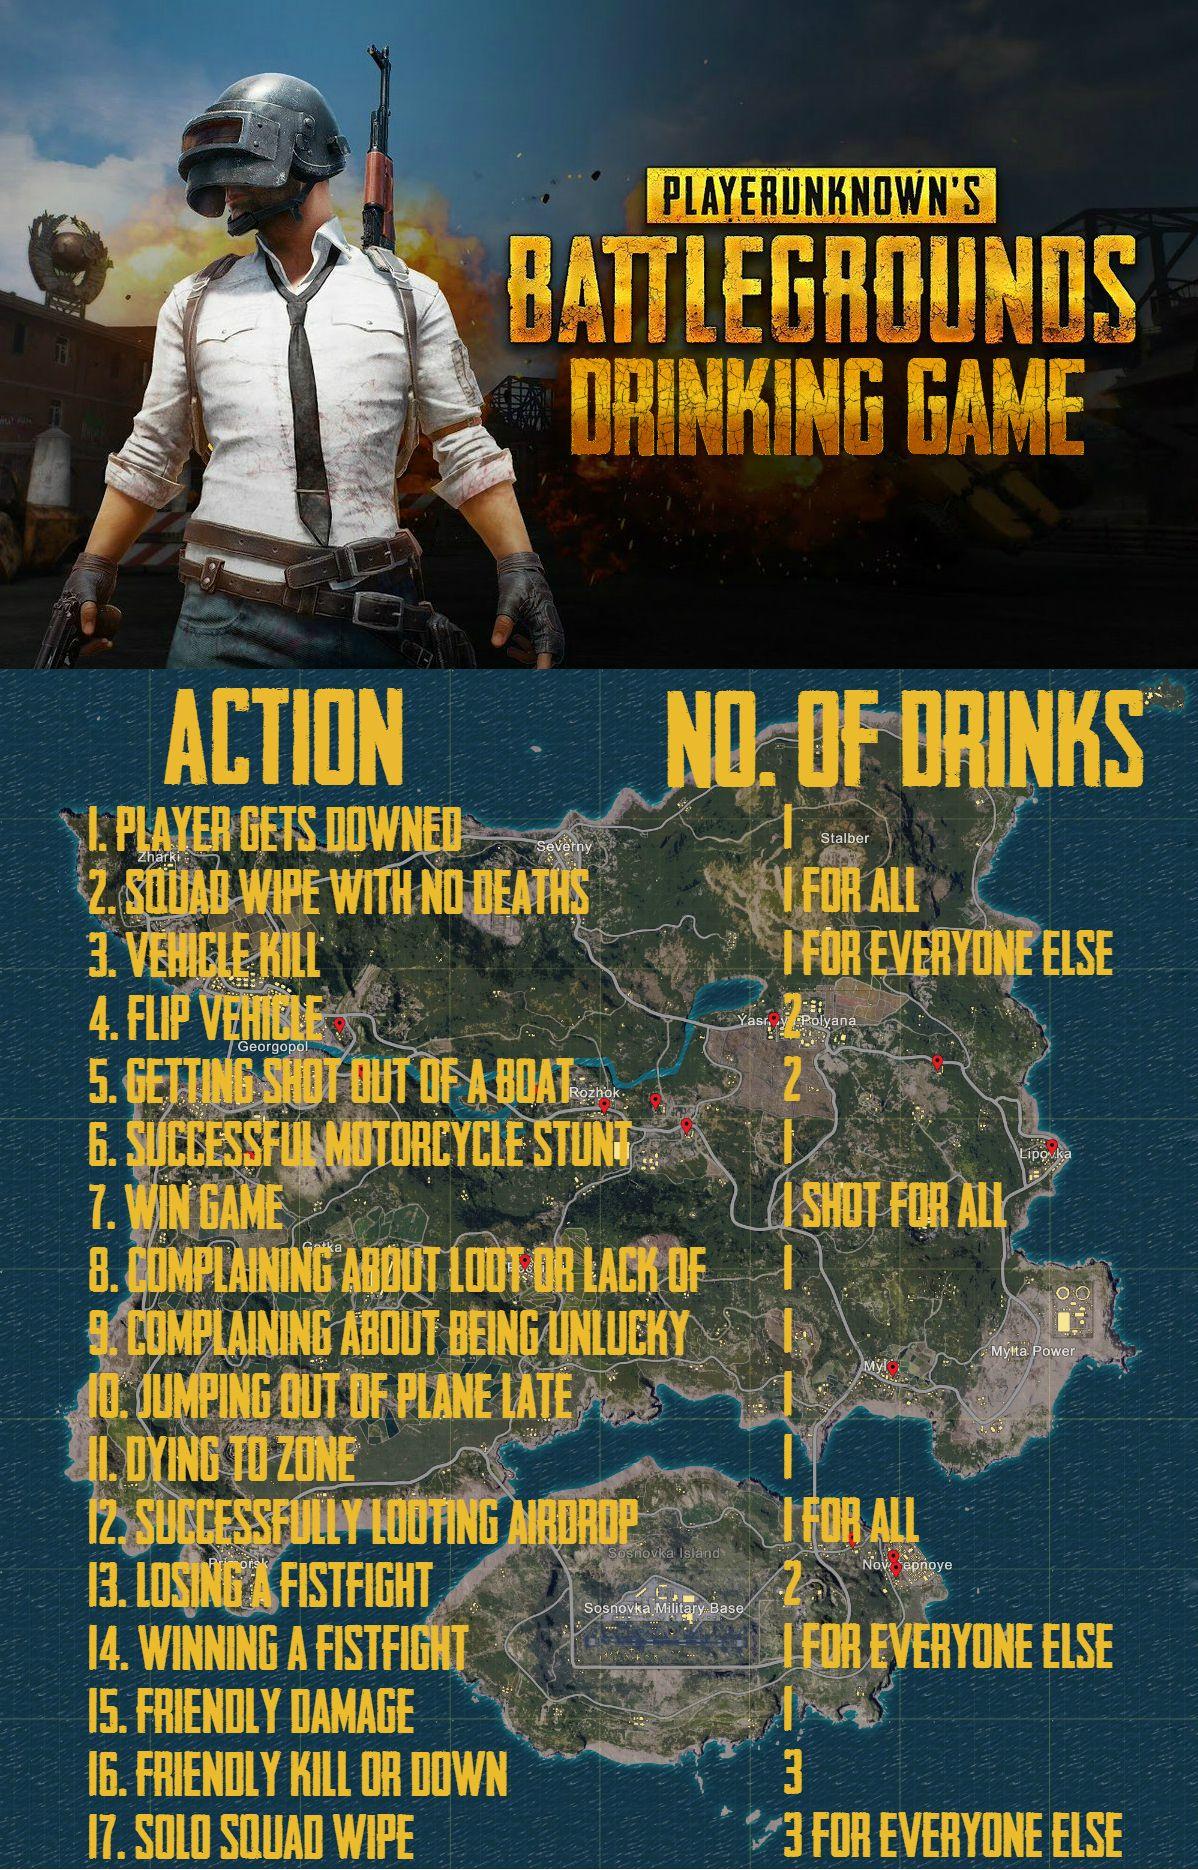 Pubg drinking game